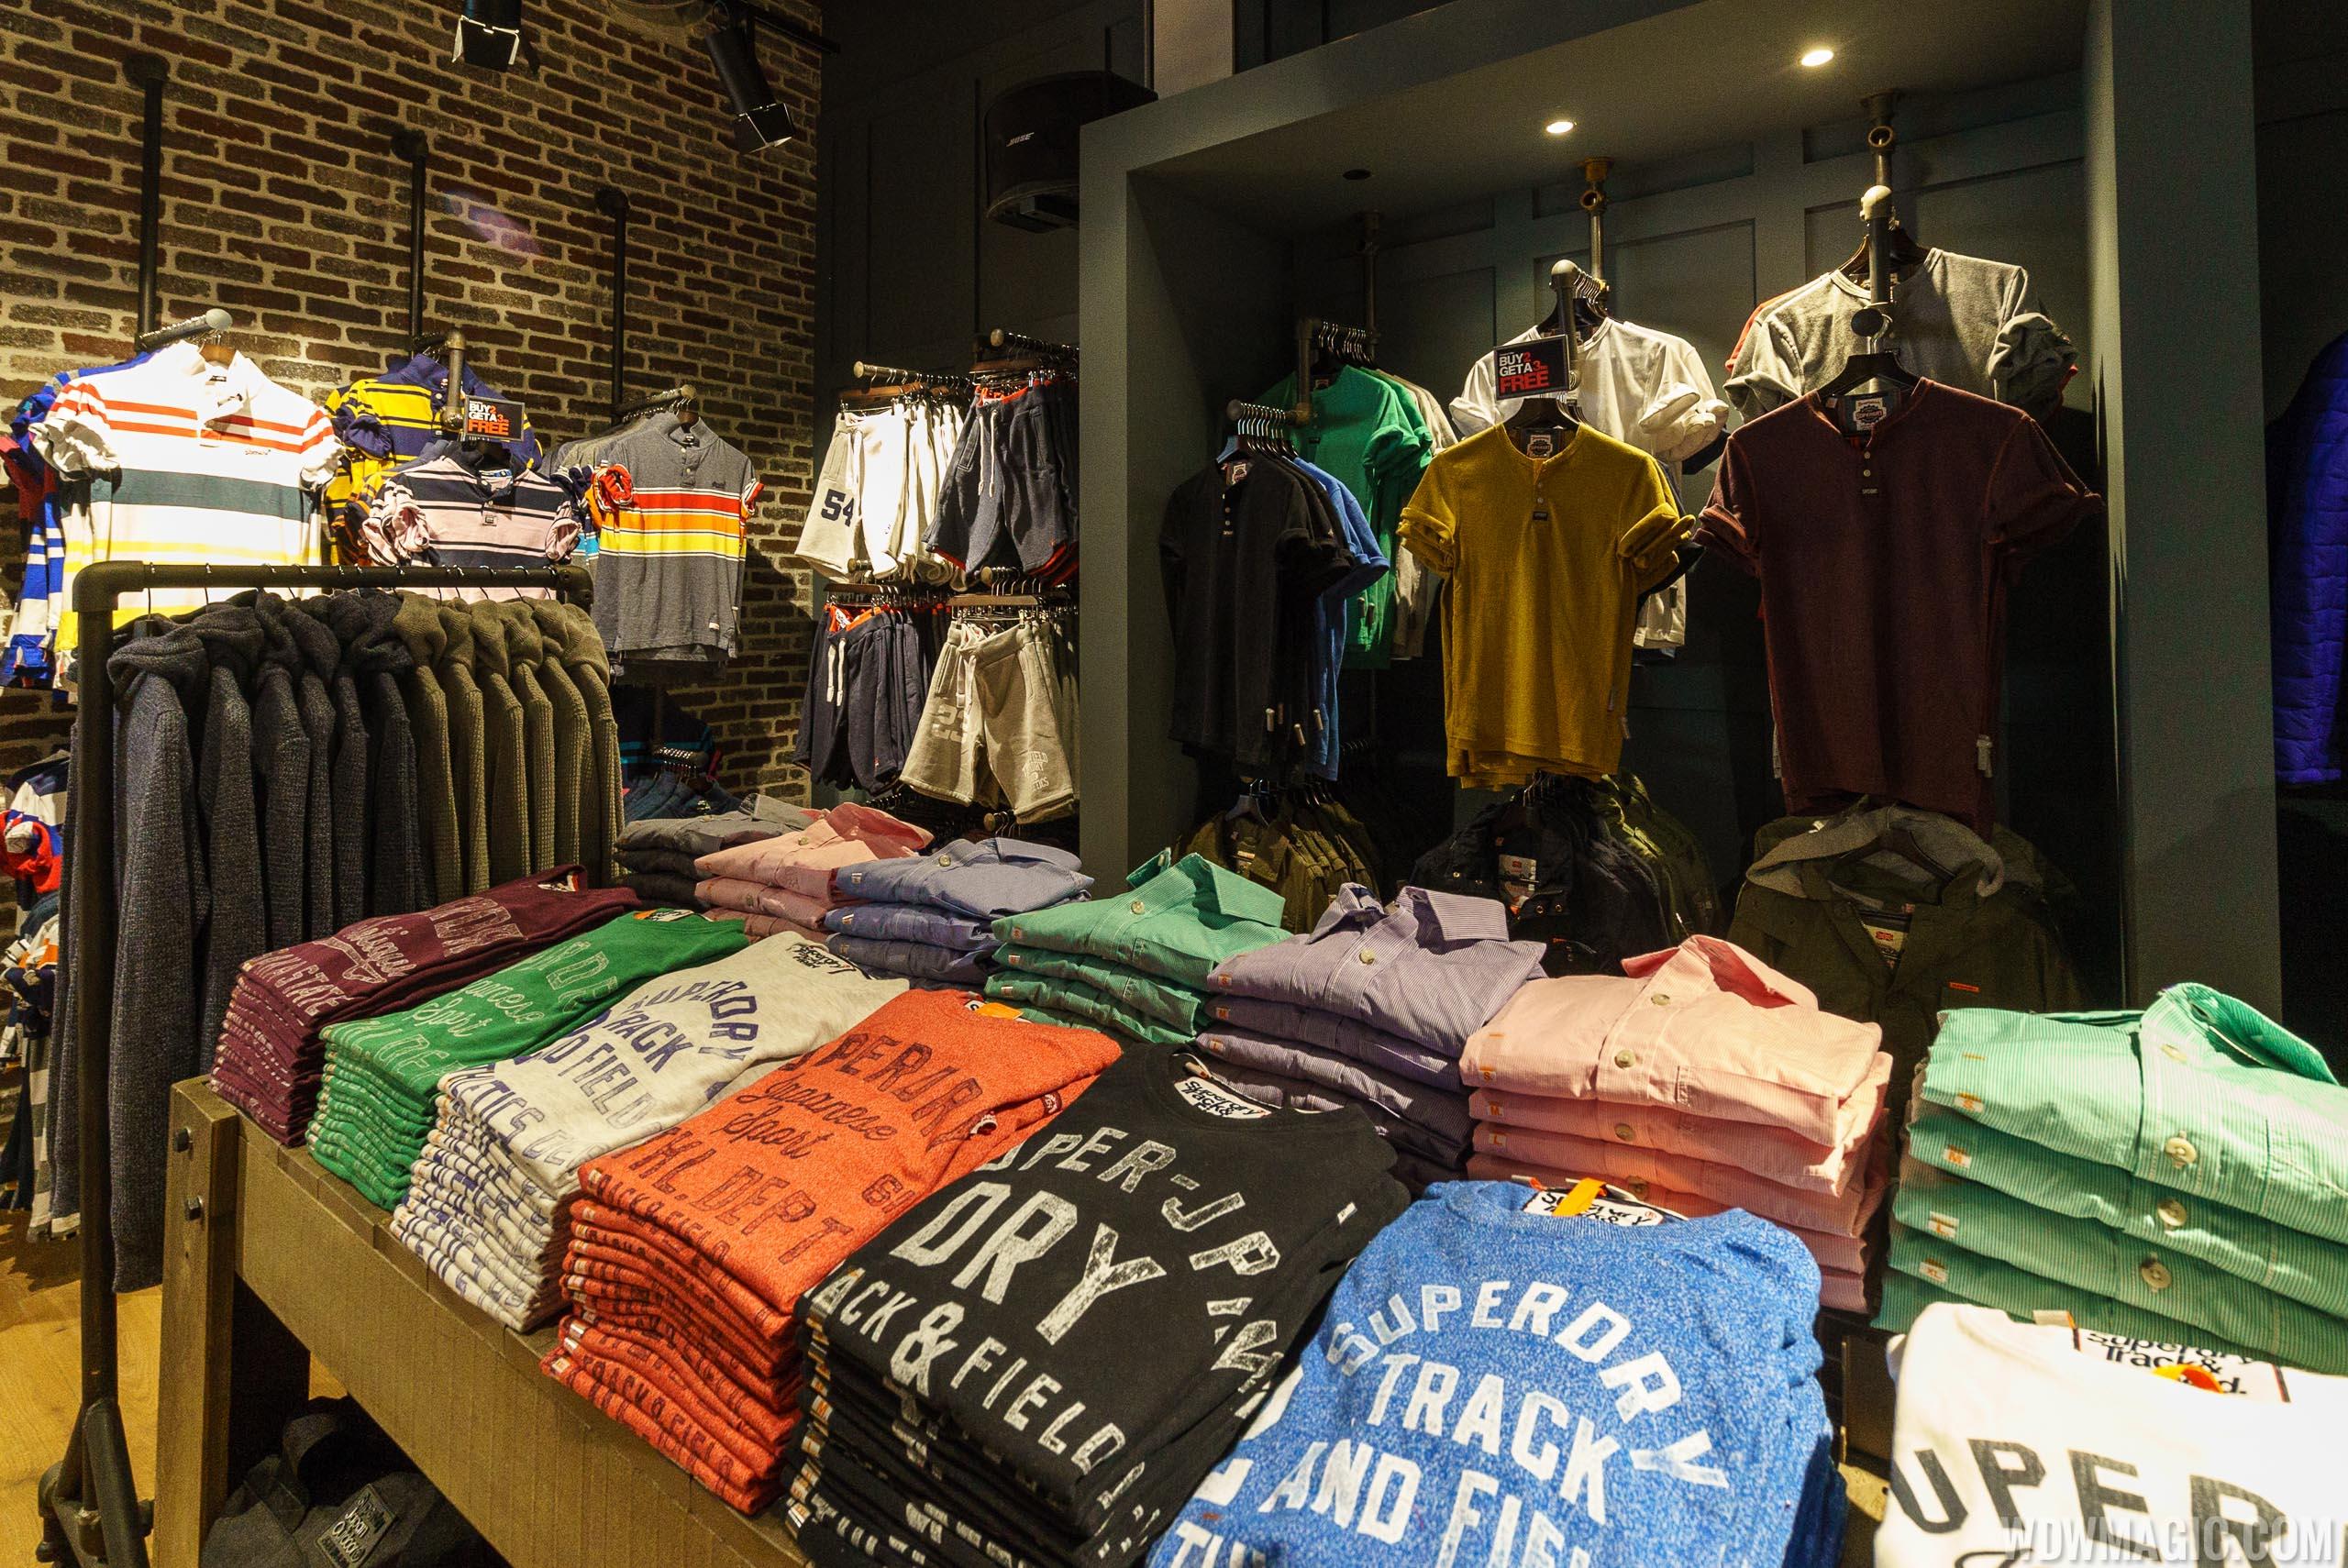 Superdry merchandise